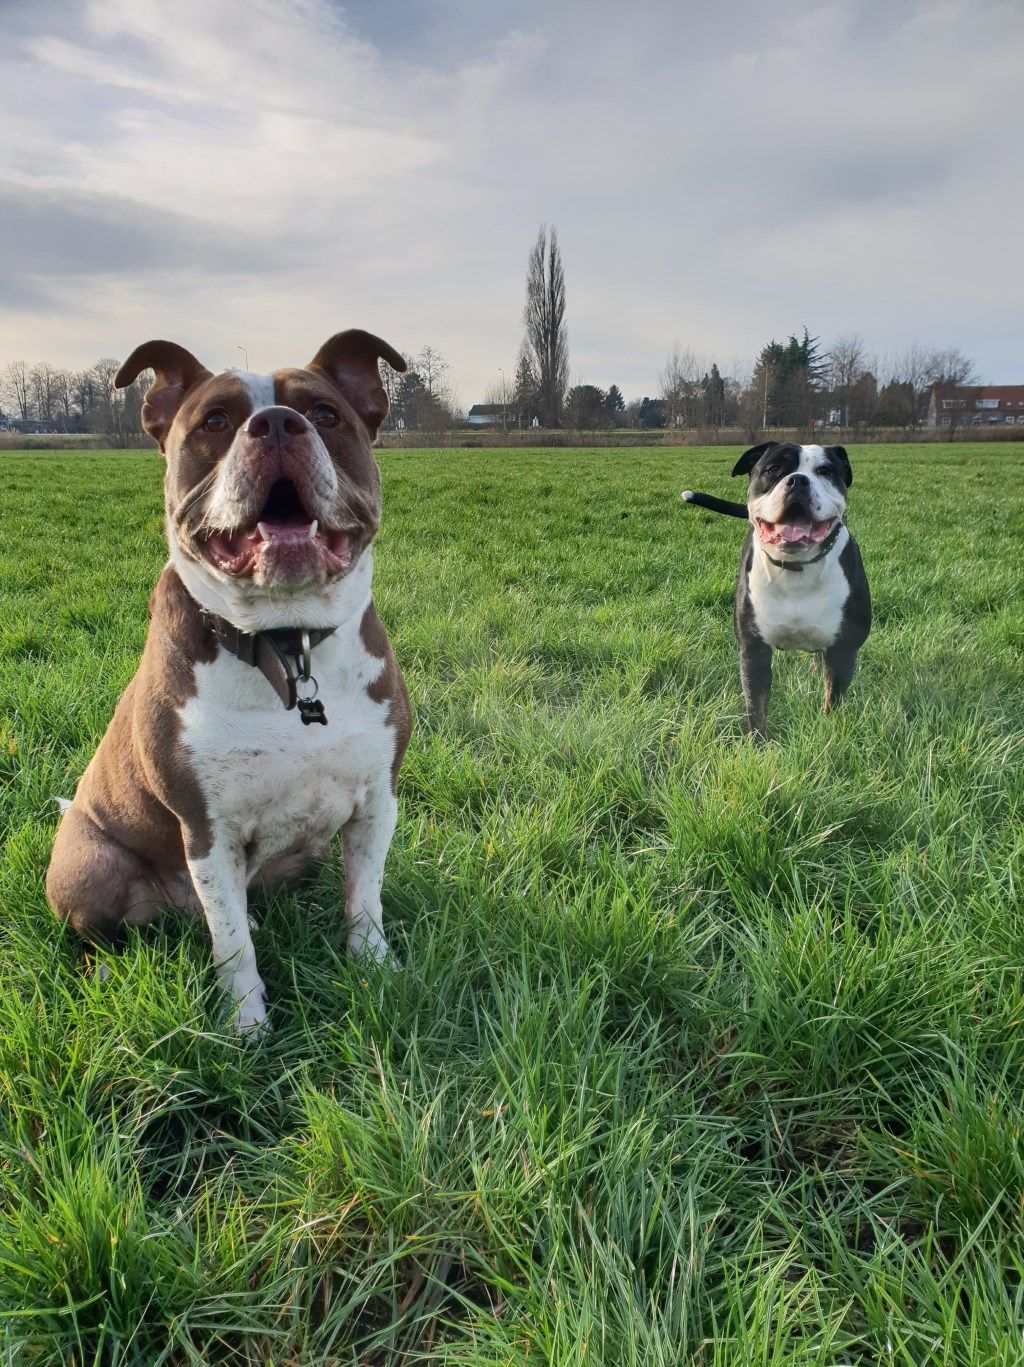 Macho en Bella (old english bulldogs) doen ook graag mee. (Anouk Huibers)  © deMooiLaarbeekkrant